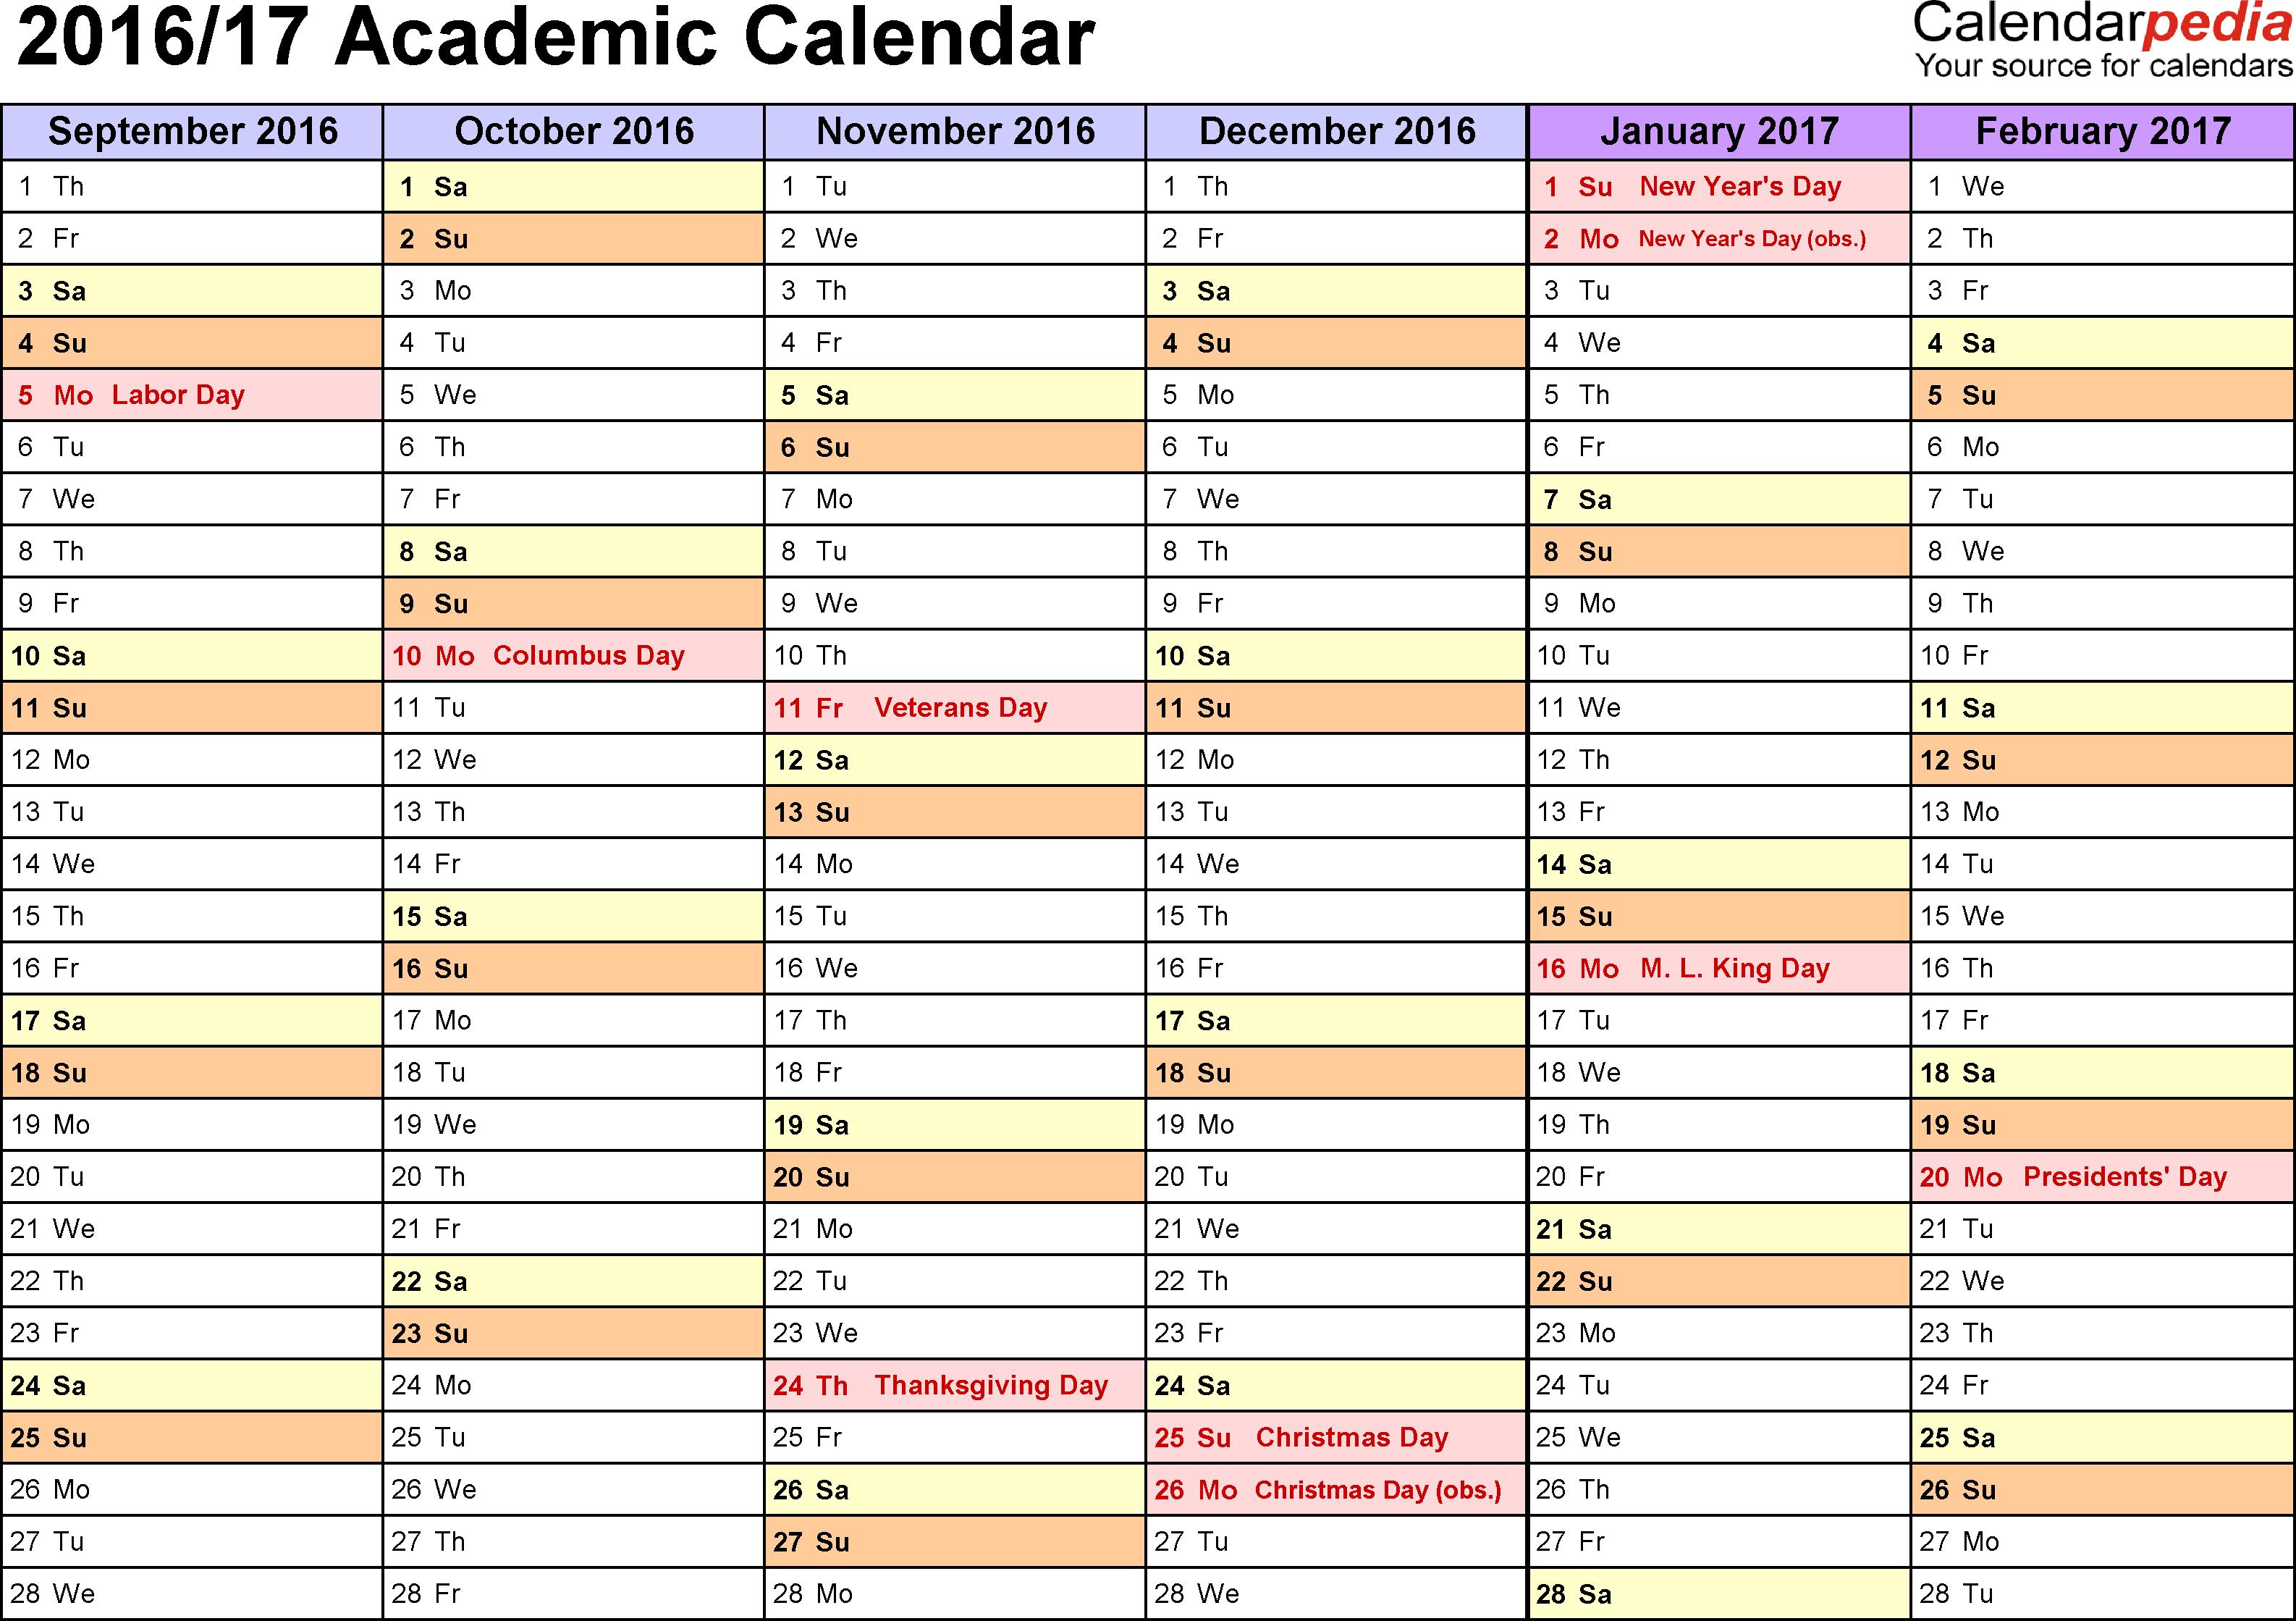 Academic Calendars 2016/2017 - Free Printable Word Templates regarding Academic Calendar Template